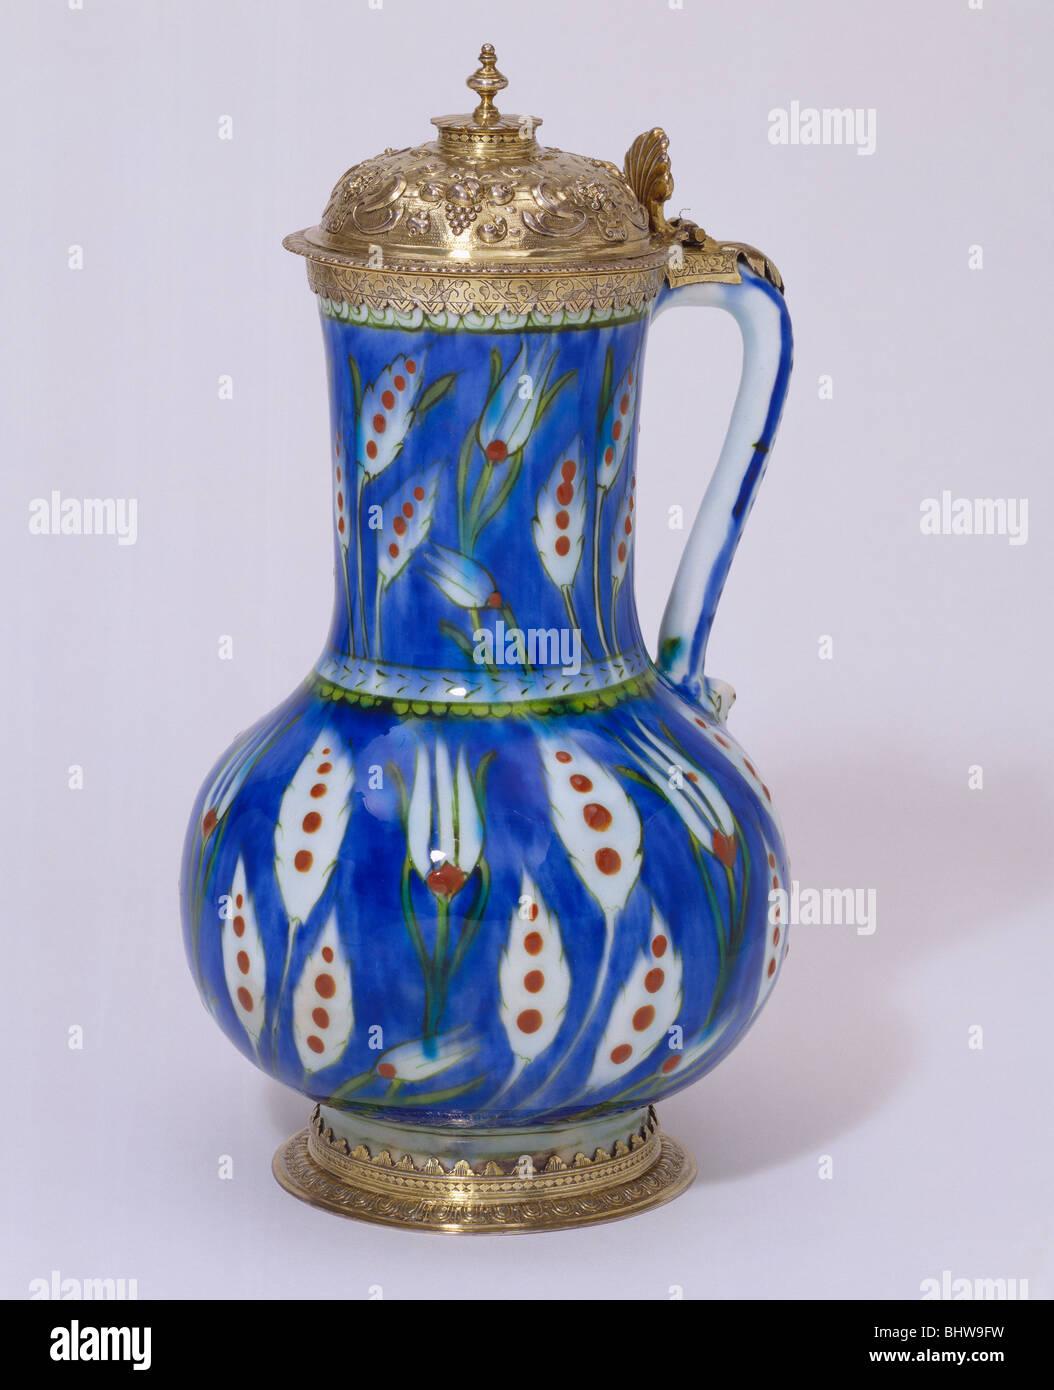 Mounted jug. Turkey and England, 16th century - Stock Image